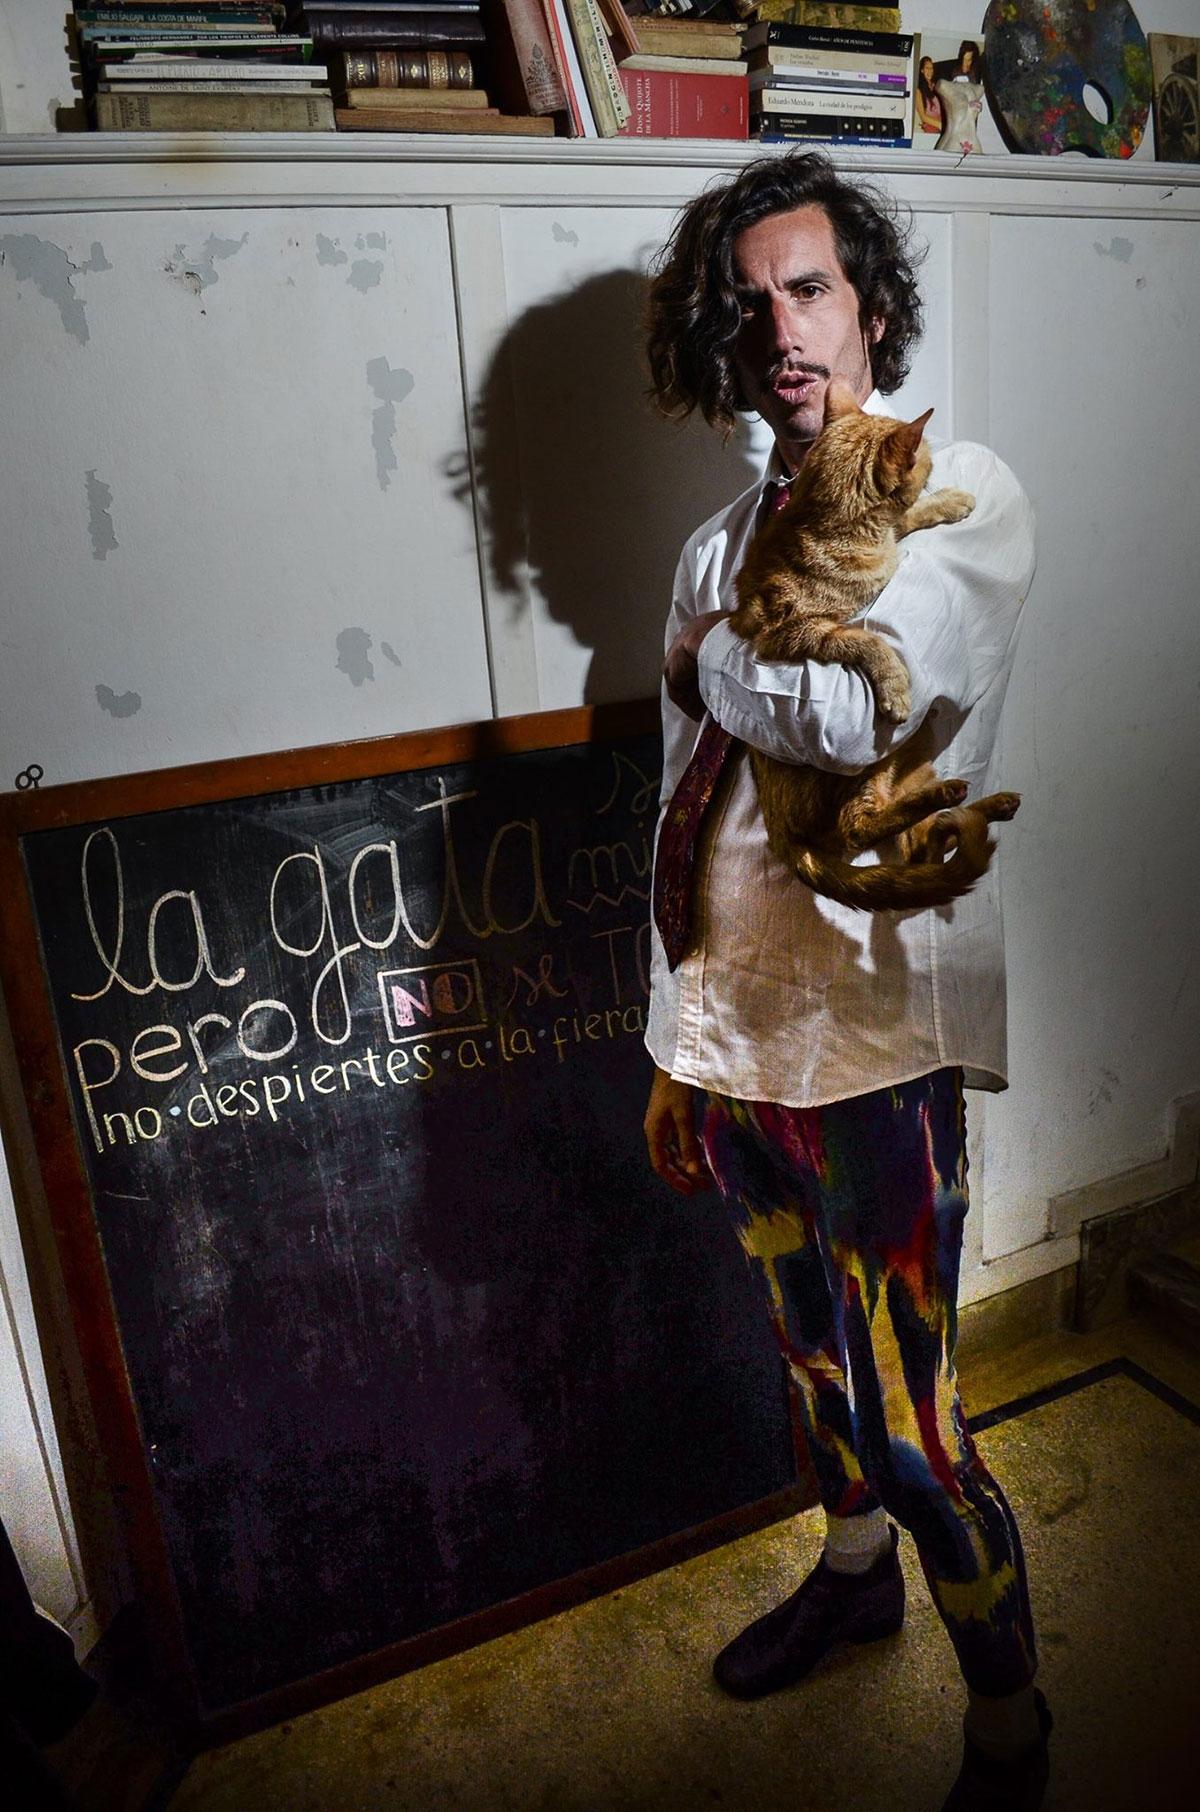 Fotorreportaje a Martín Barea Mattos - Diciembre 2017 - Foto Paola Scagliotti www.cooltivarte.com